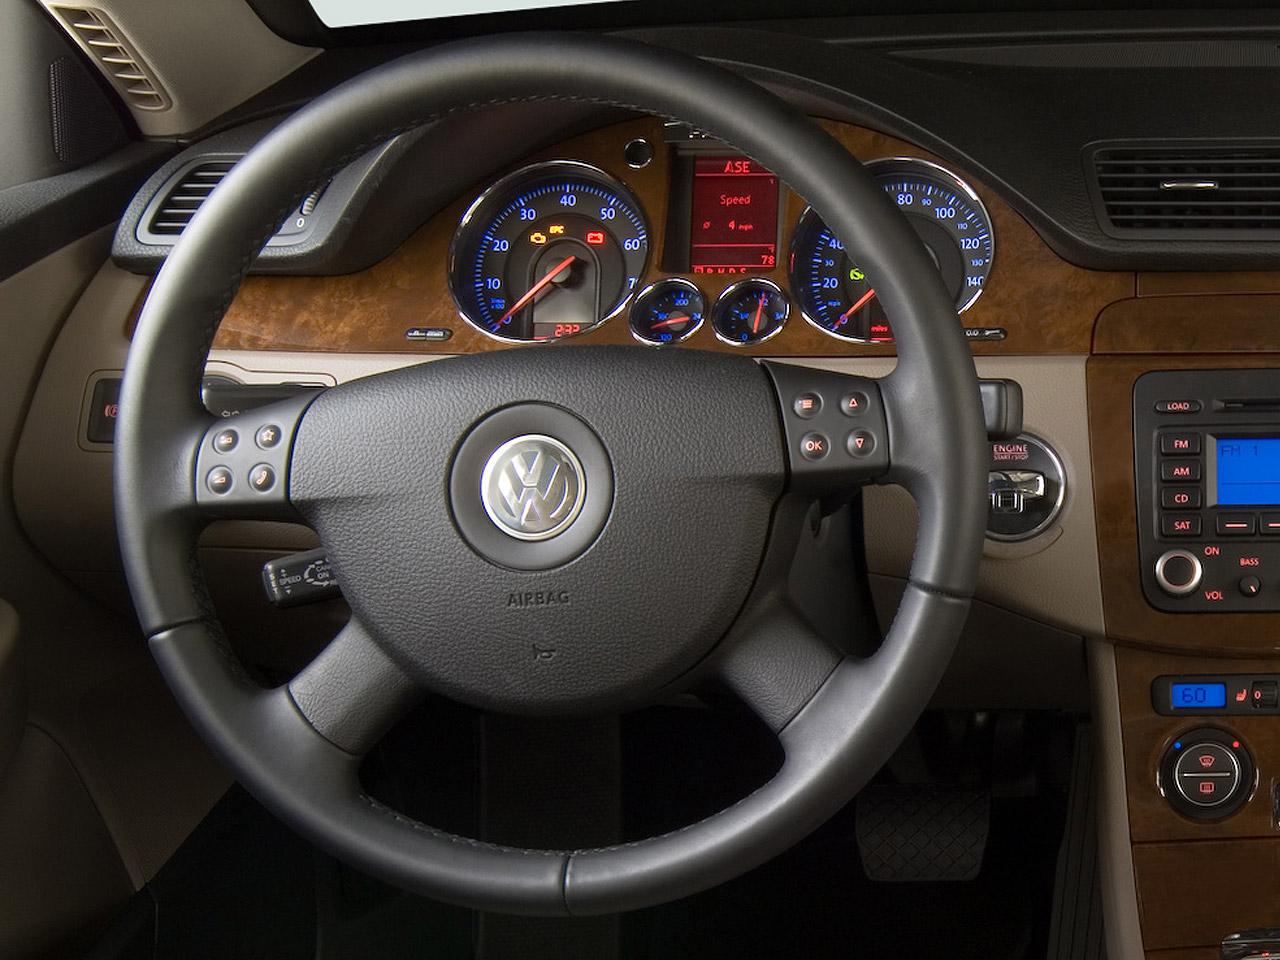 2007 volkswagen passat wagon car review road test. Black Bedroom Furniture Sets. Home Design Ideas